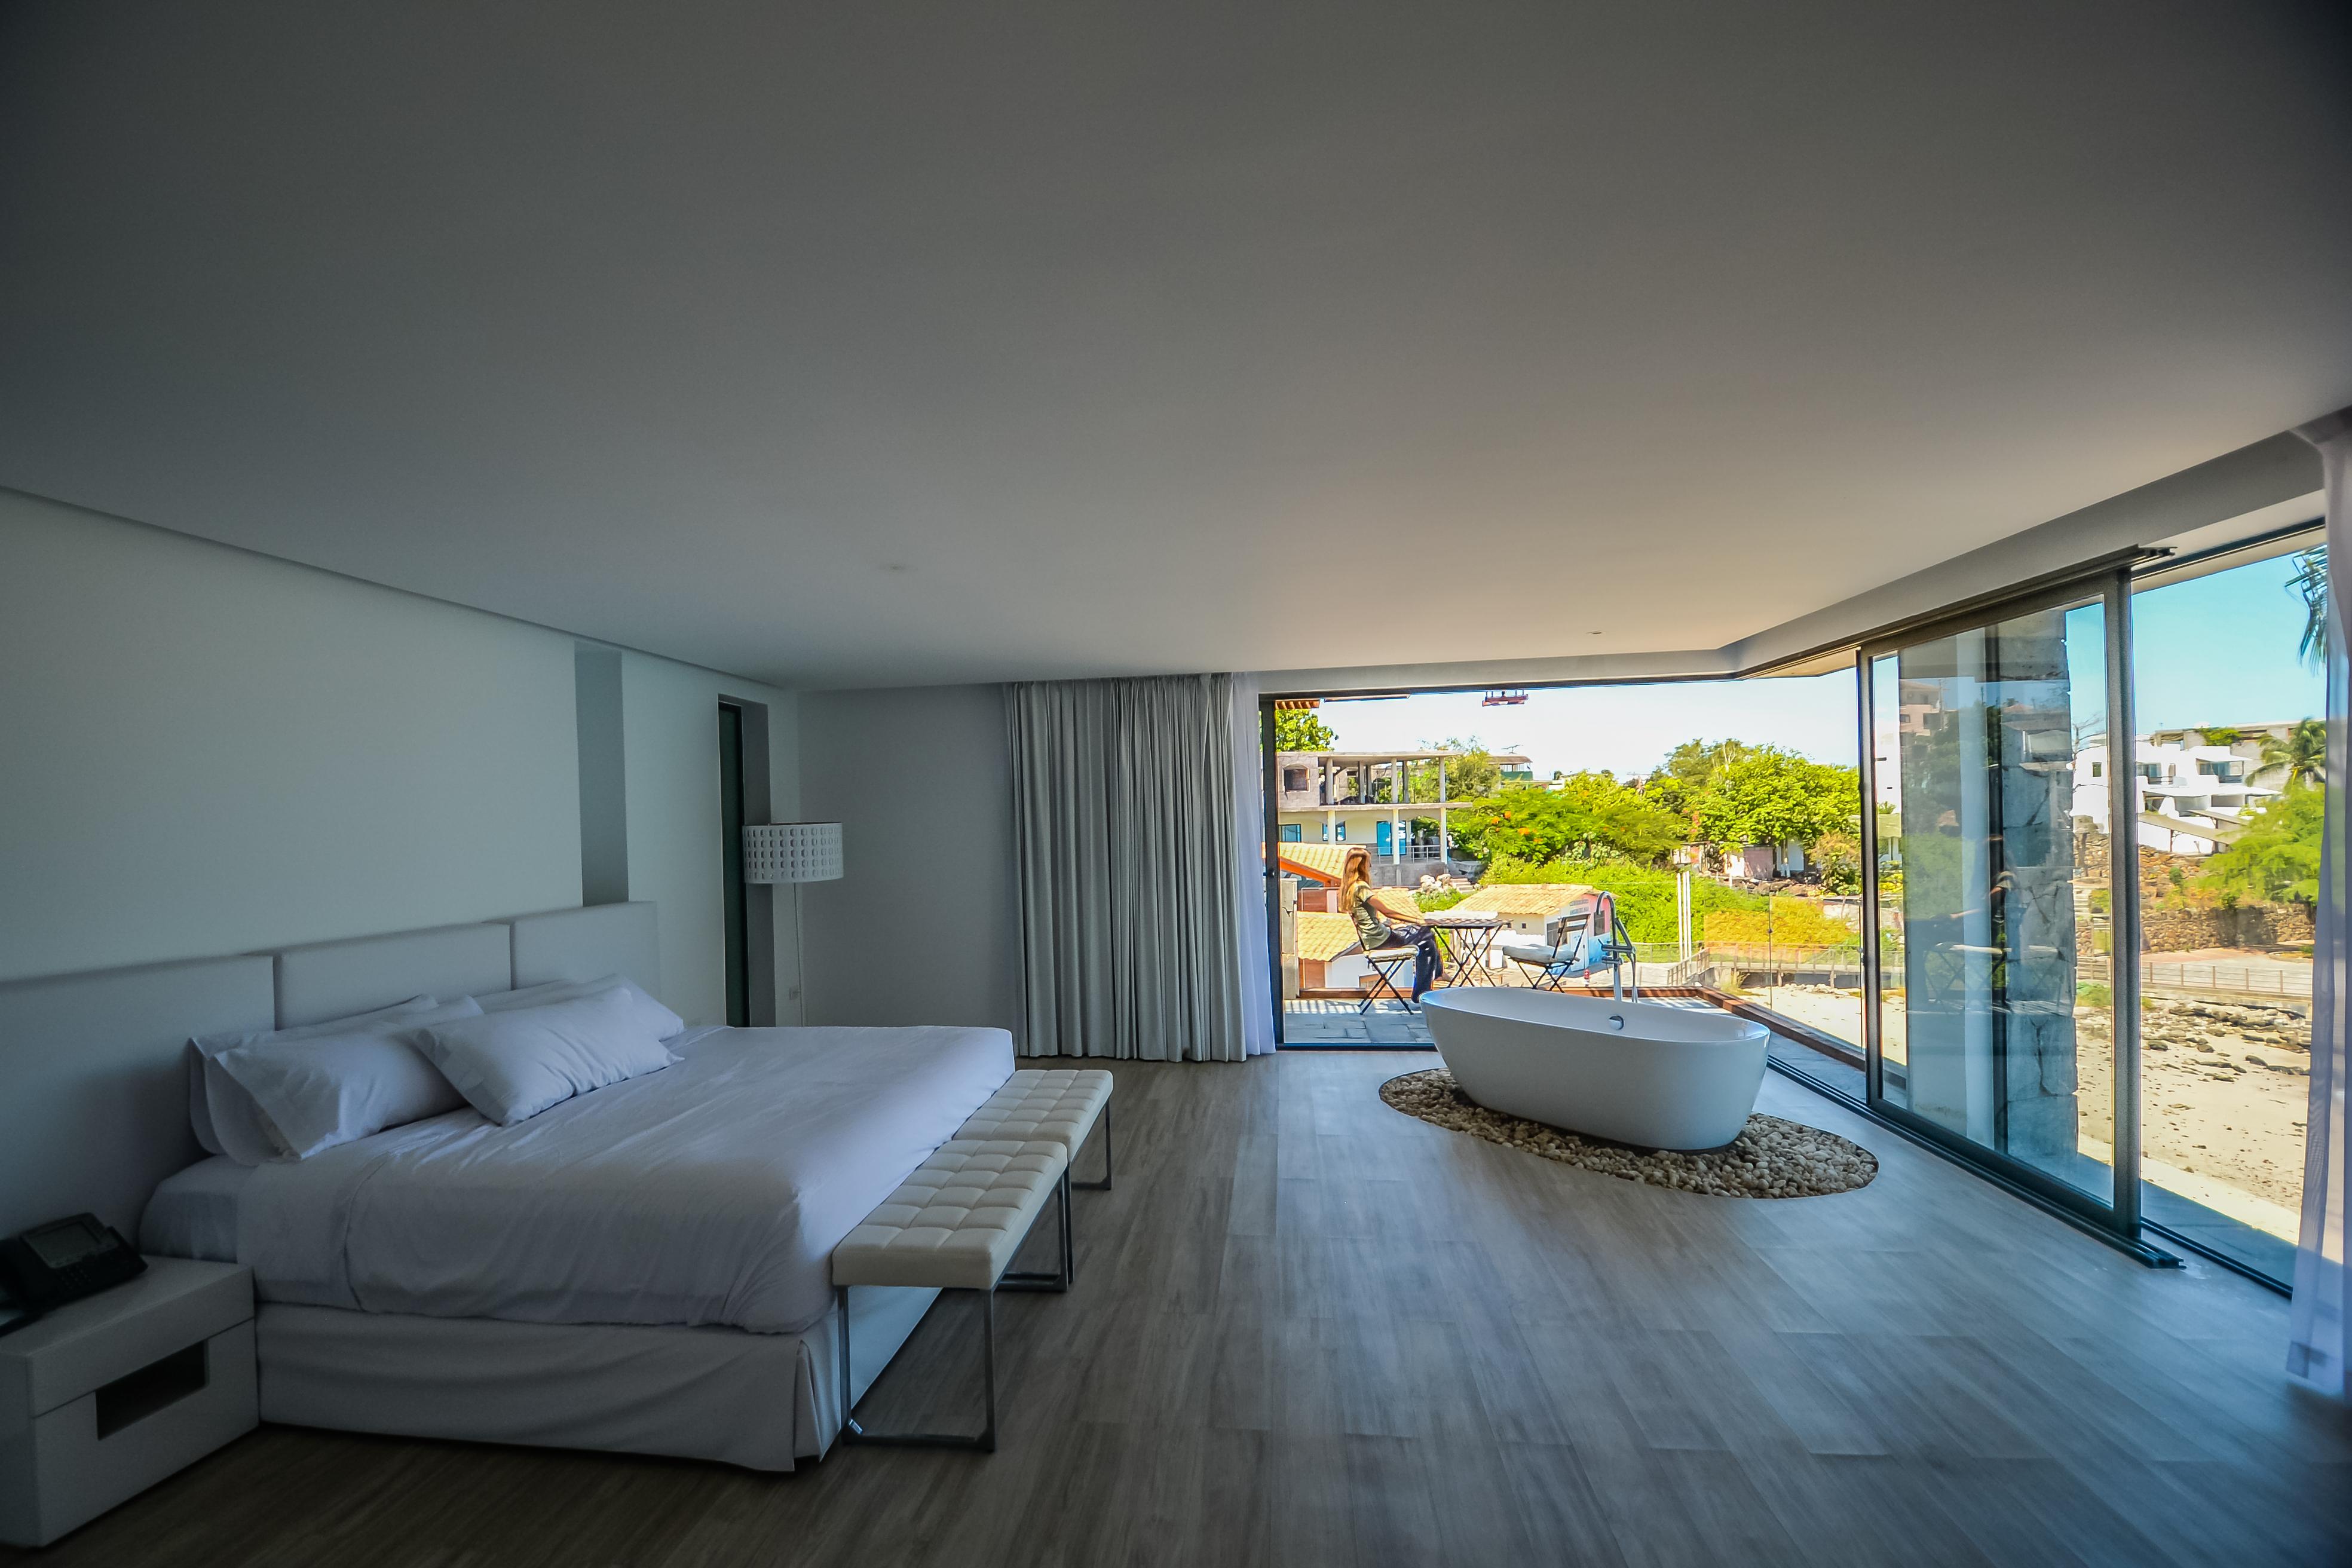 Opuntia Hotels Launches Three Stellar Beachfront Hotels In